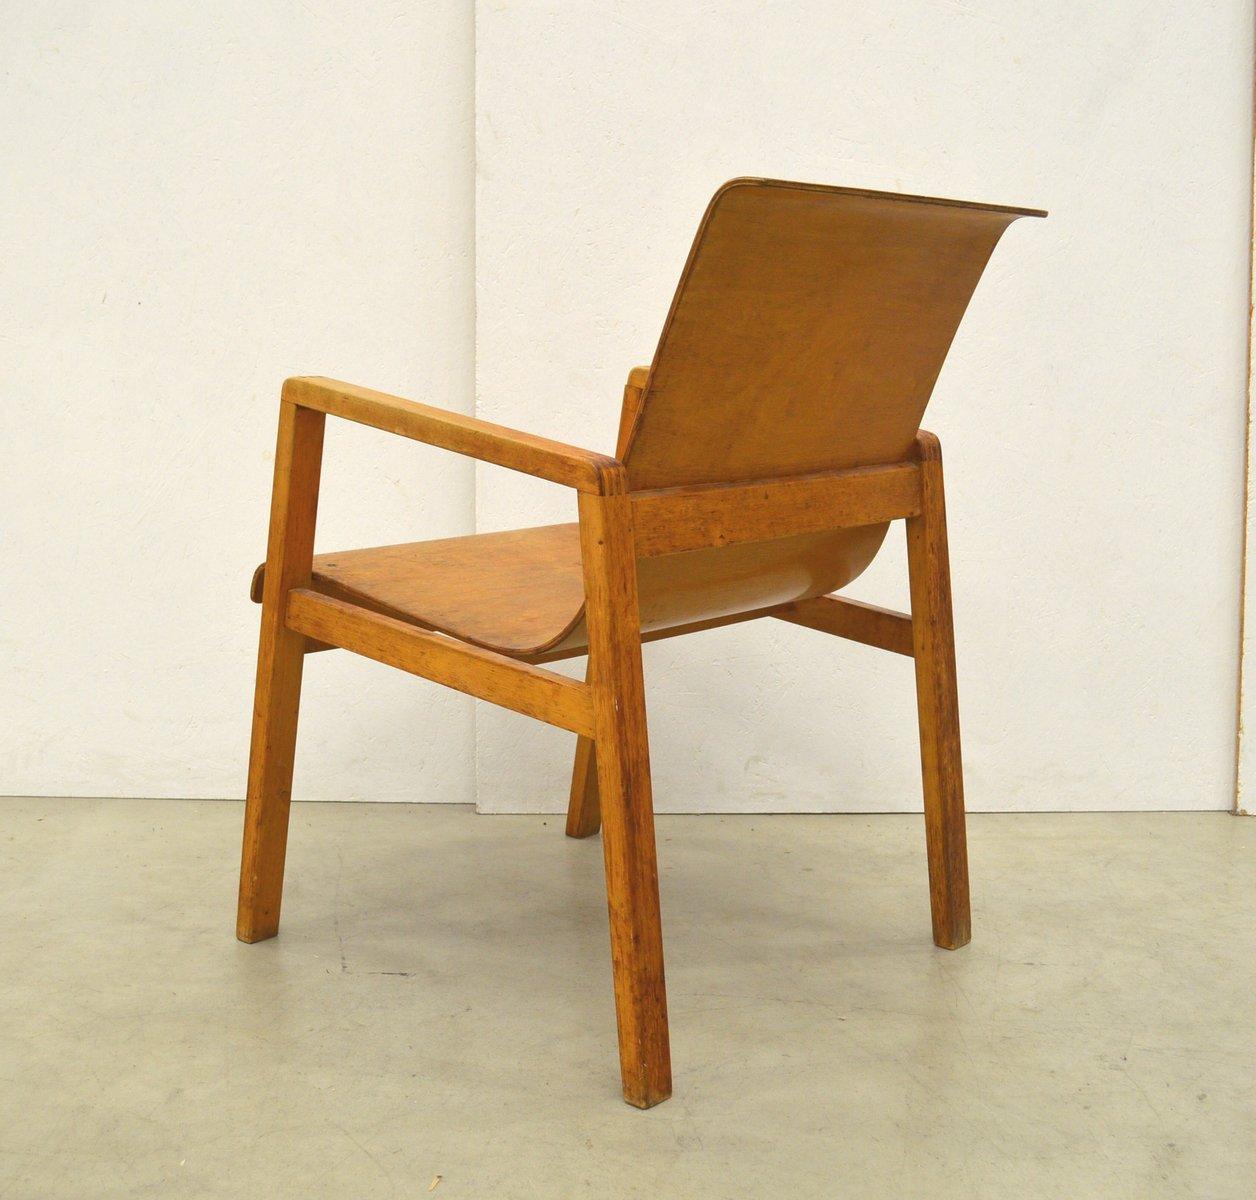 birkenholz 403 stuhl von alvar aalto f r huonekalu ja rakennusty te 1930er bei pamono kaufen. Black Bedroom Furniture Sets. Home Design Ideas